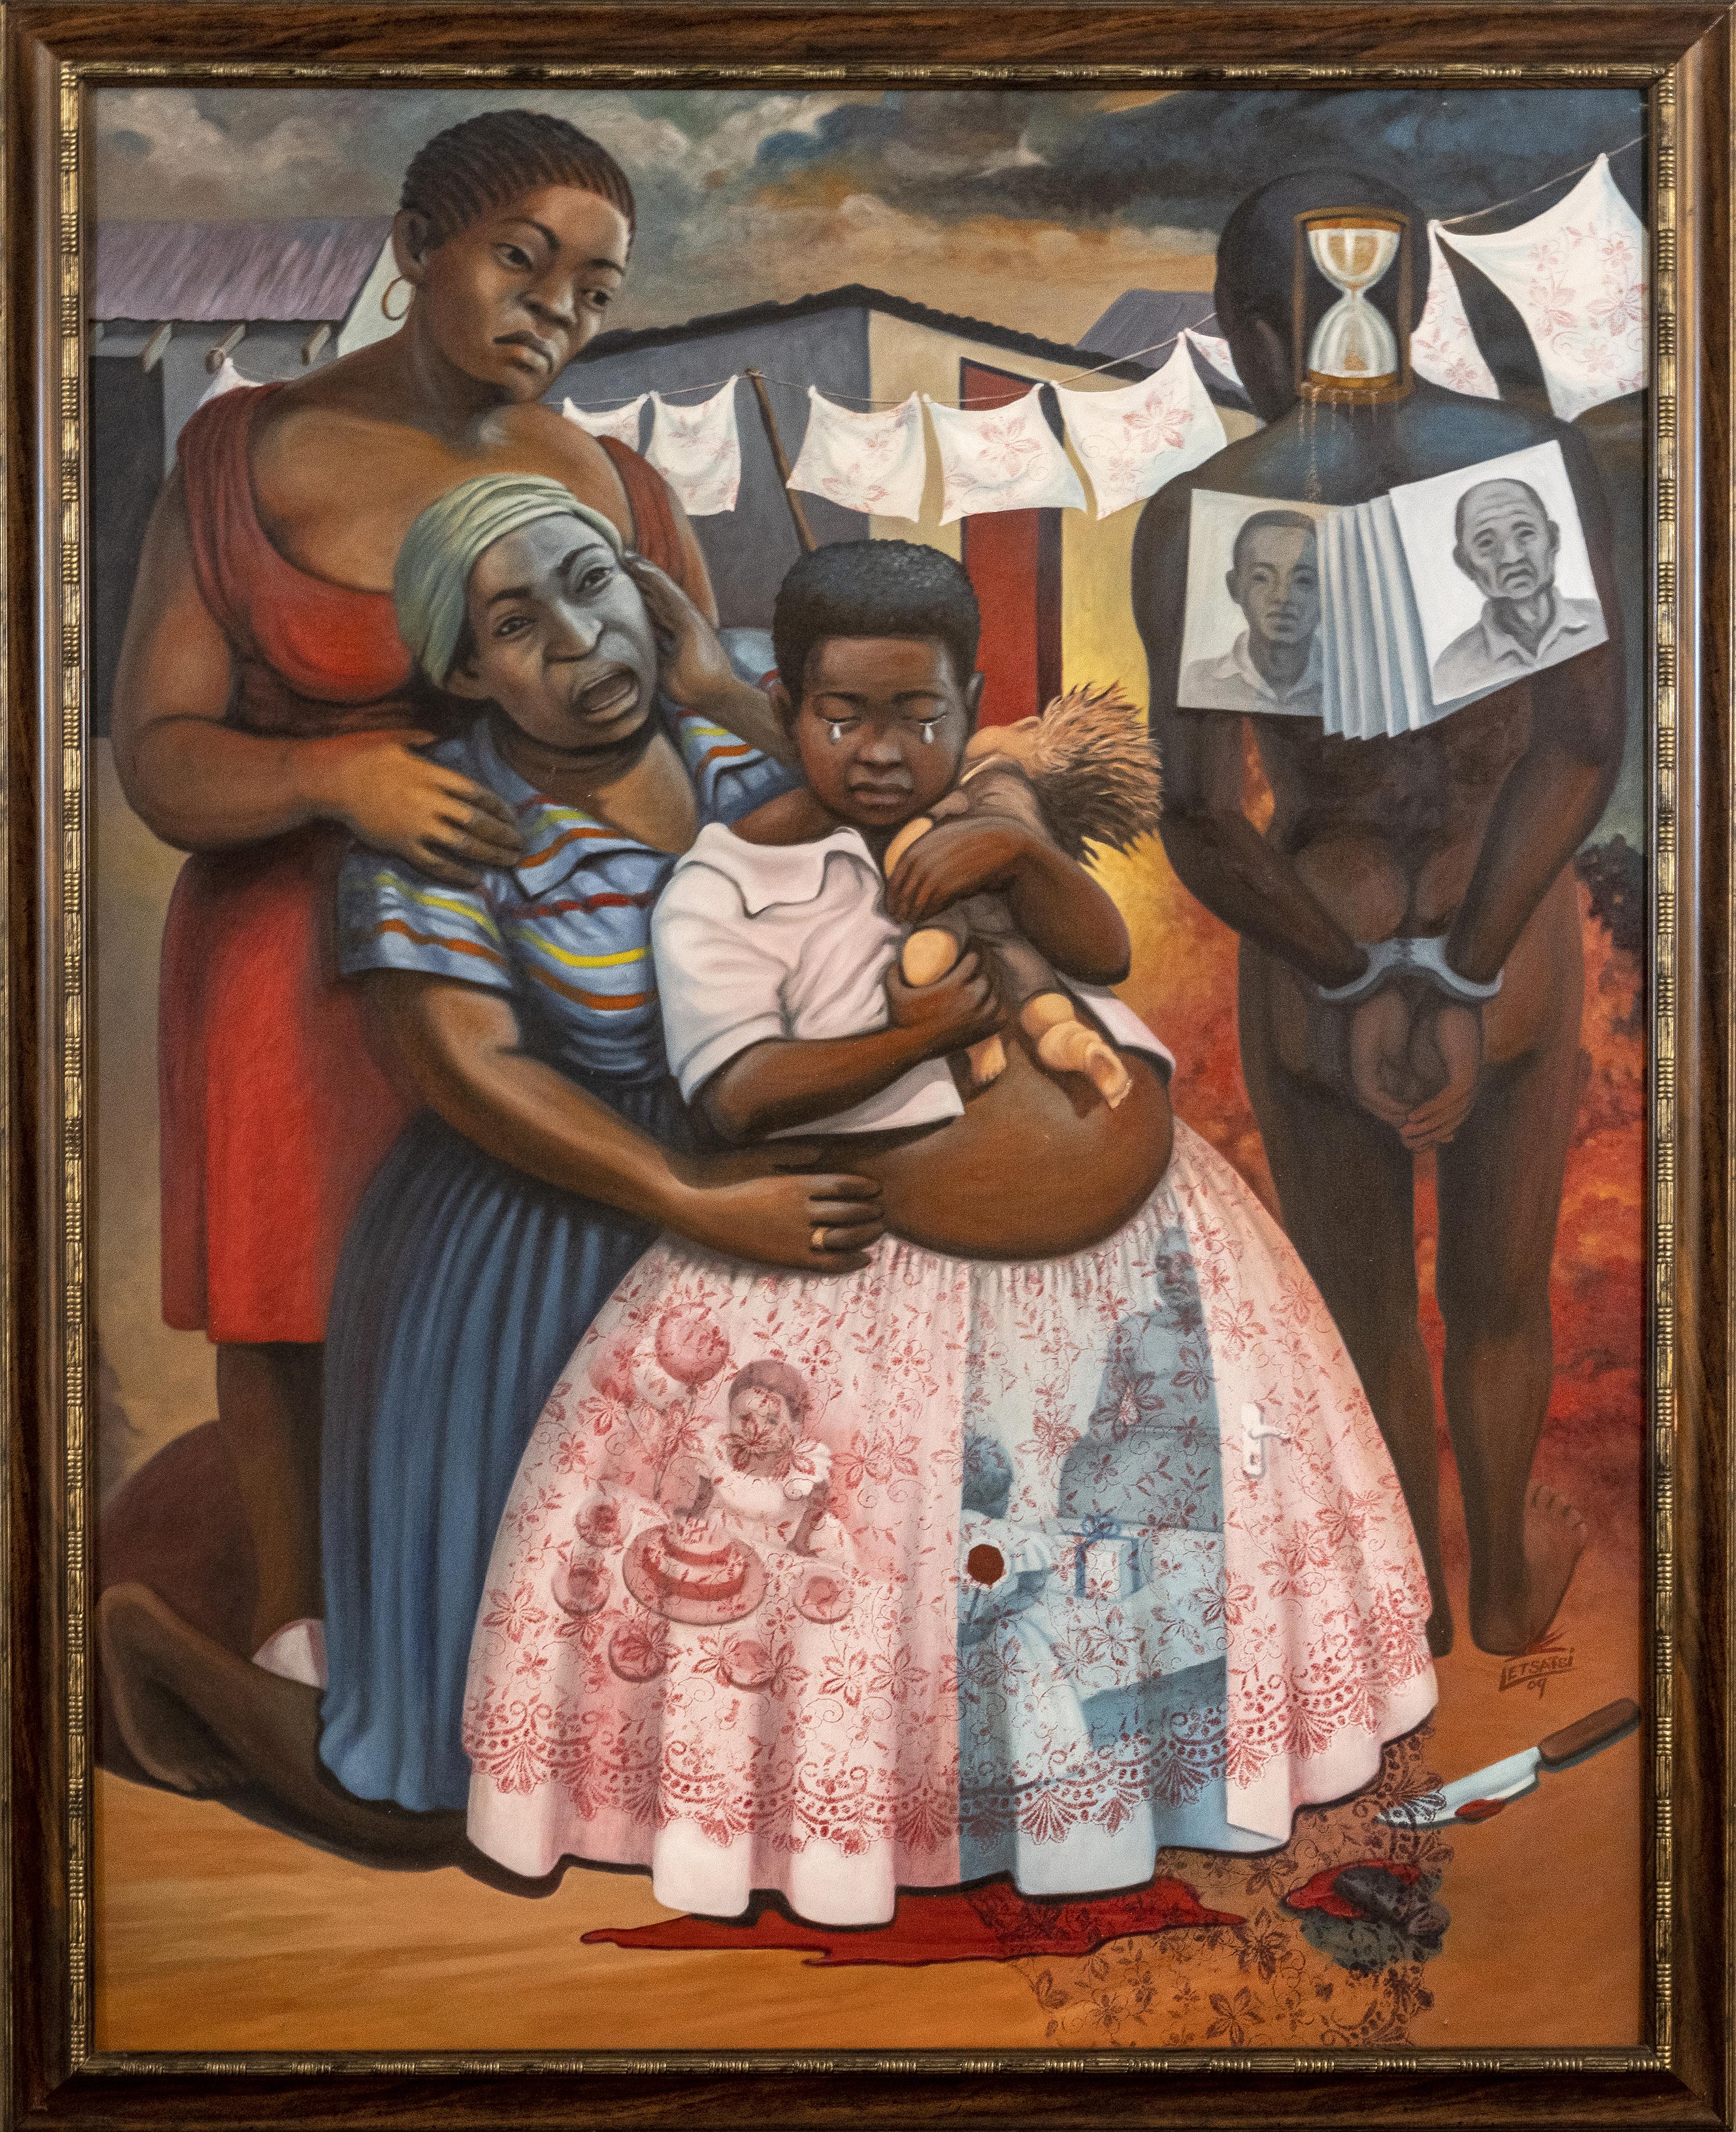 Richard Letsatsi Bolleurs, Shattered Innocence, 2009, Oil on canvas, 140 x 110cm. UFS Art Collection.